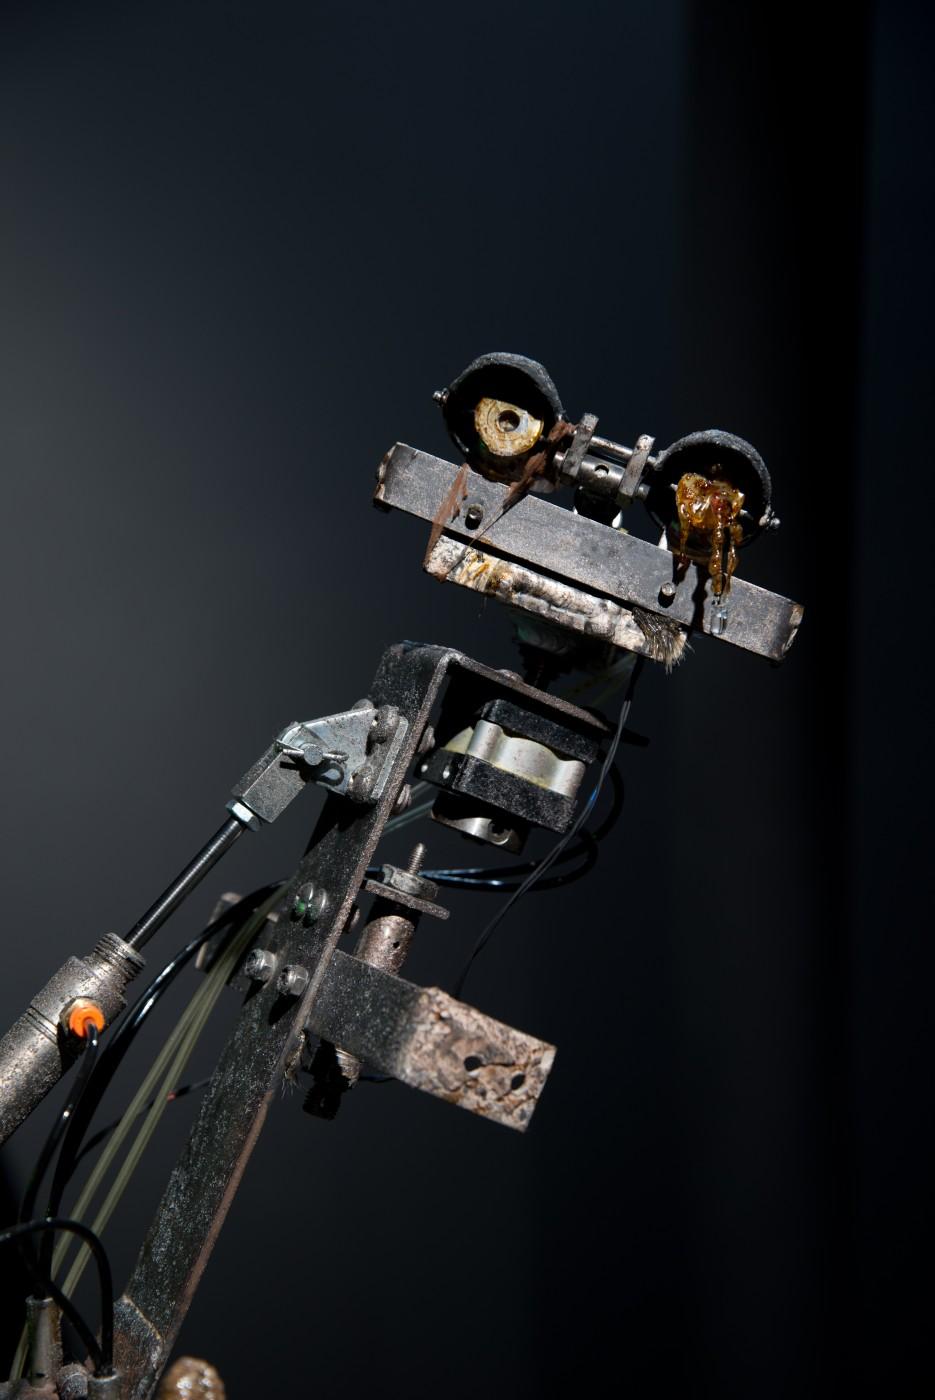 NATURE THEATER OF VIOLENT SUCCESSION  Friend (Avian Endoskeleton)</I>, 2015 (detail) Animatronic avian endoskeleton, pneumatic compressor, desiccated marine sea cucumbers, found detritus, polymer resin, UV-LED light, metal plinth 162 x 40 x 38 cm / 63.8 x 15.7 x 15 in  MAX HOOPER SCHNEIDER